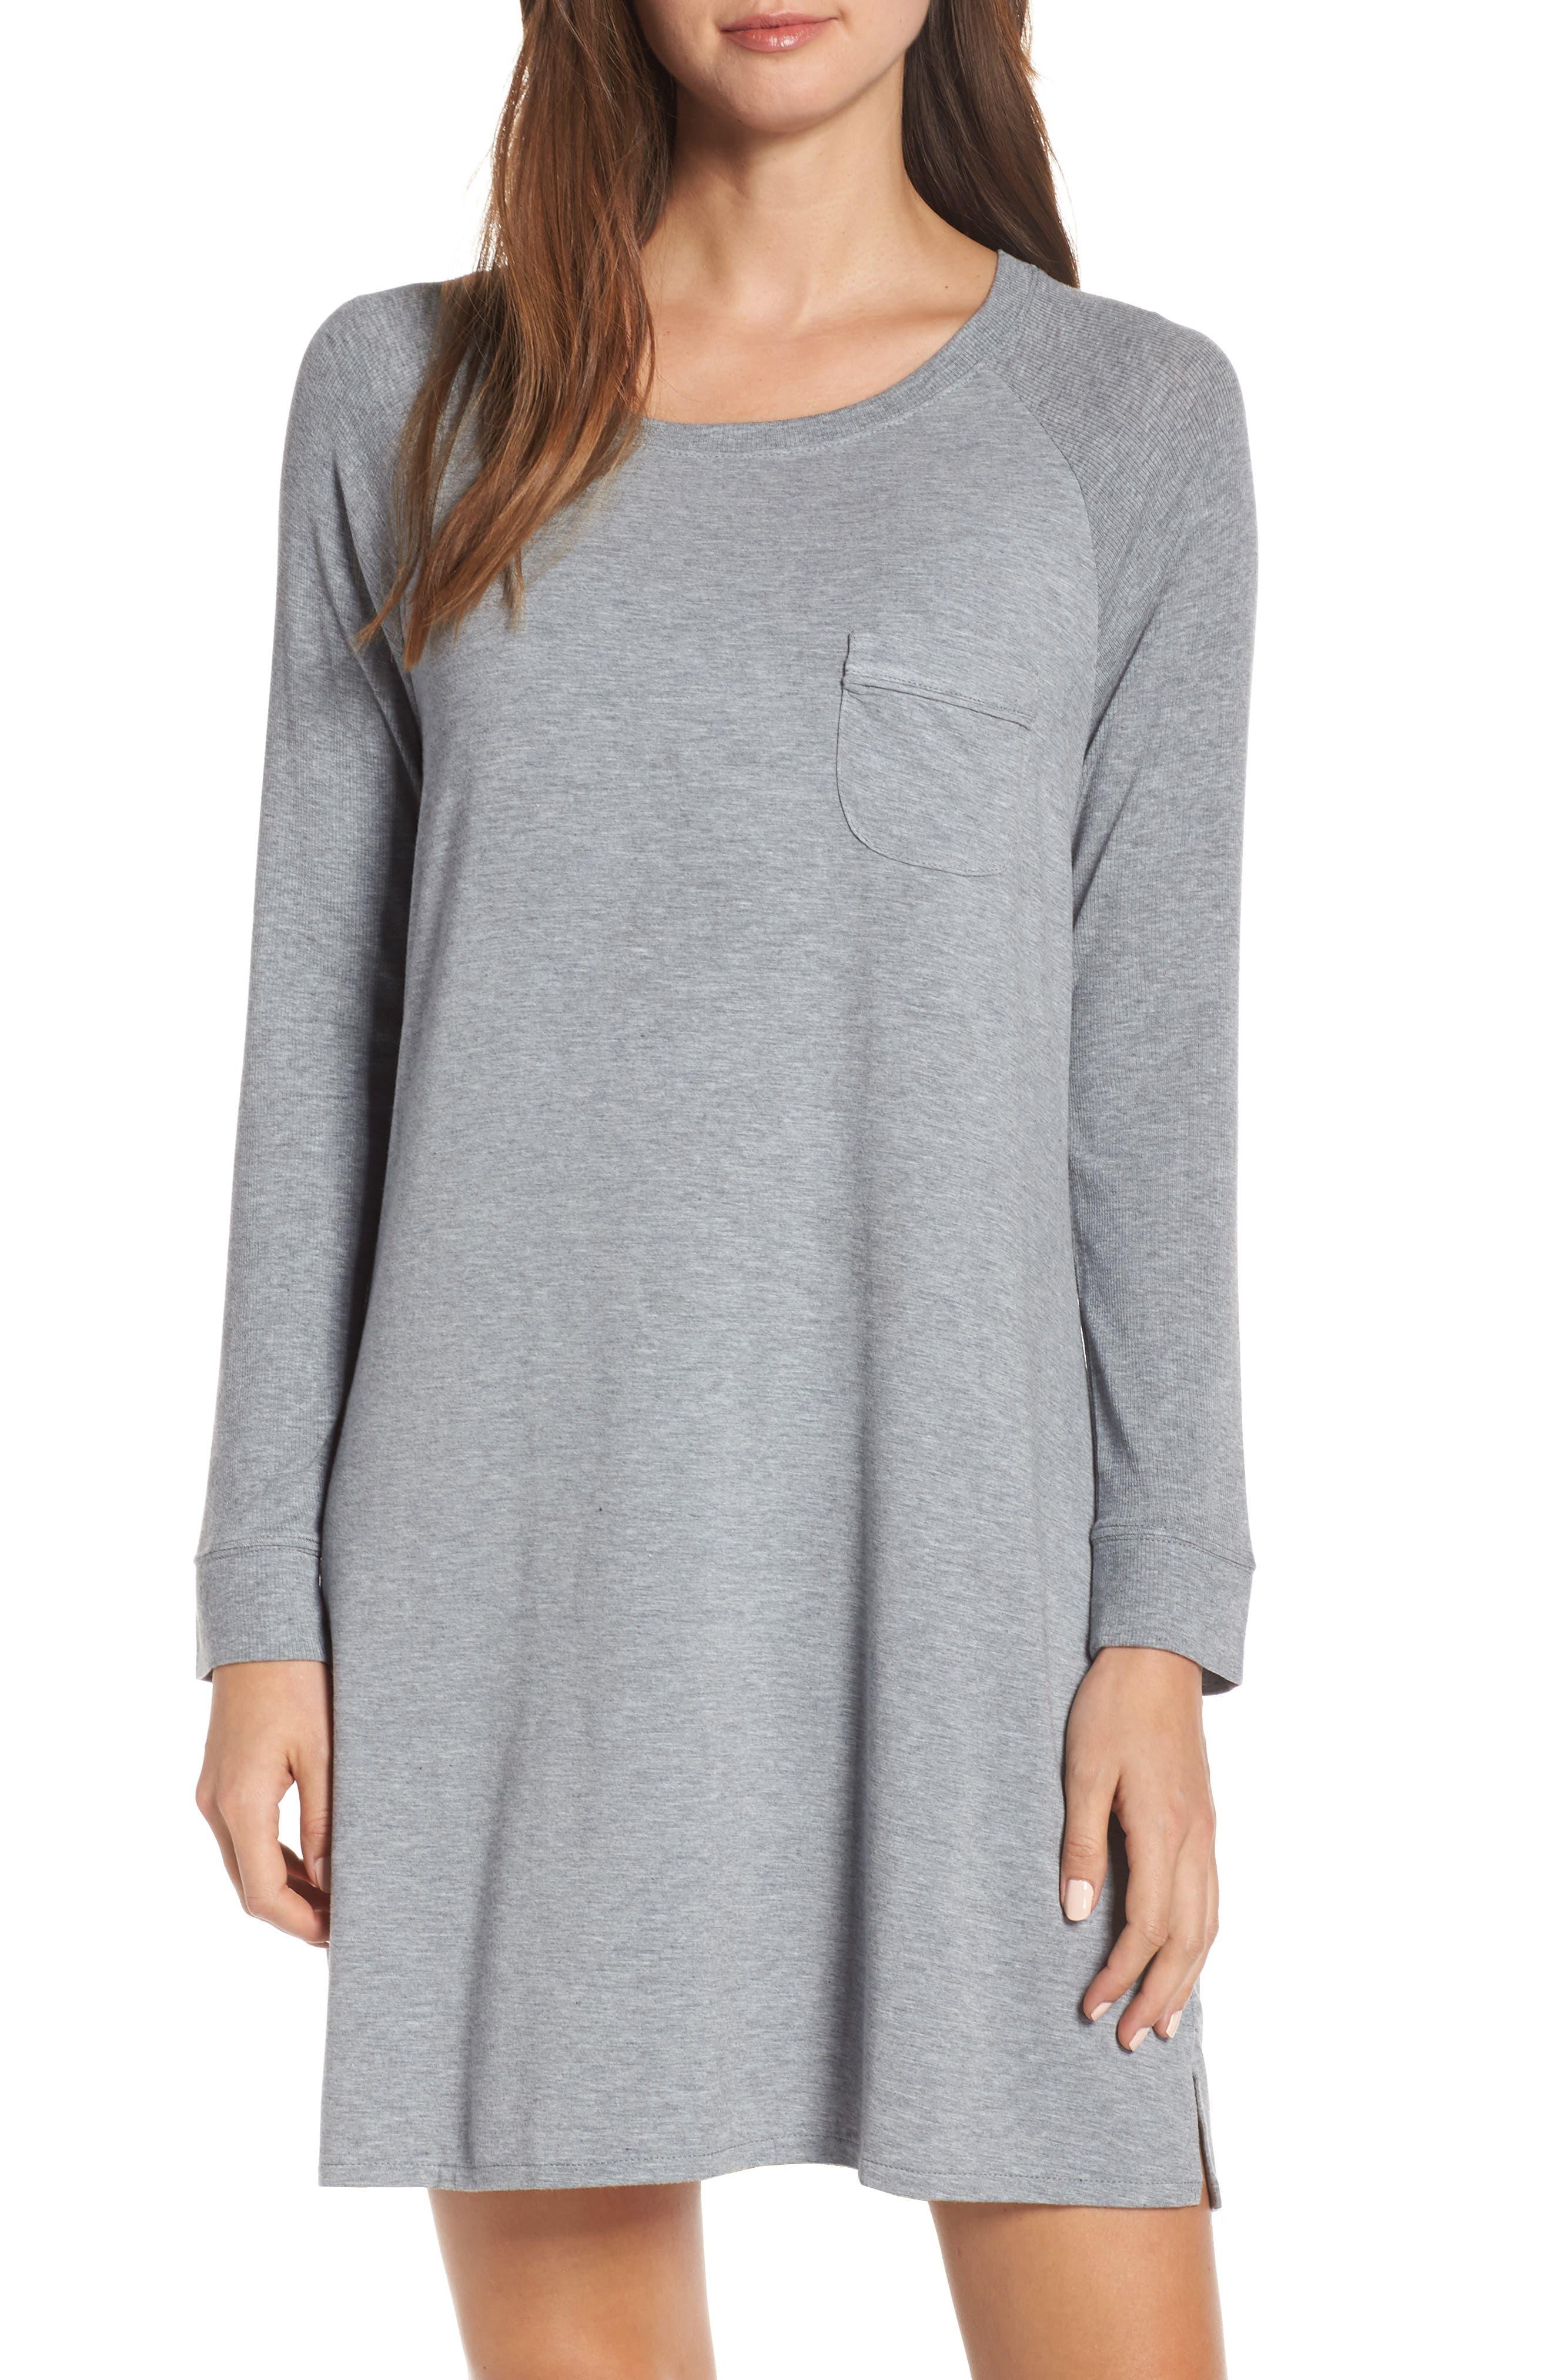 NORDSTROM LINGERIE Breathe Sleep Shirt, Main, color, GREY STEEL HEATHER